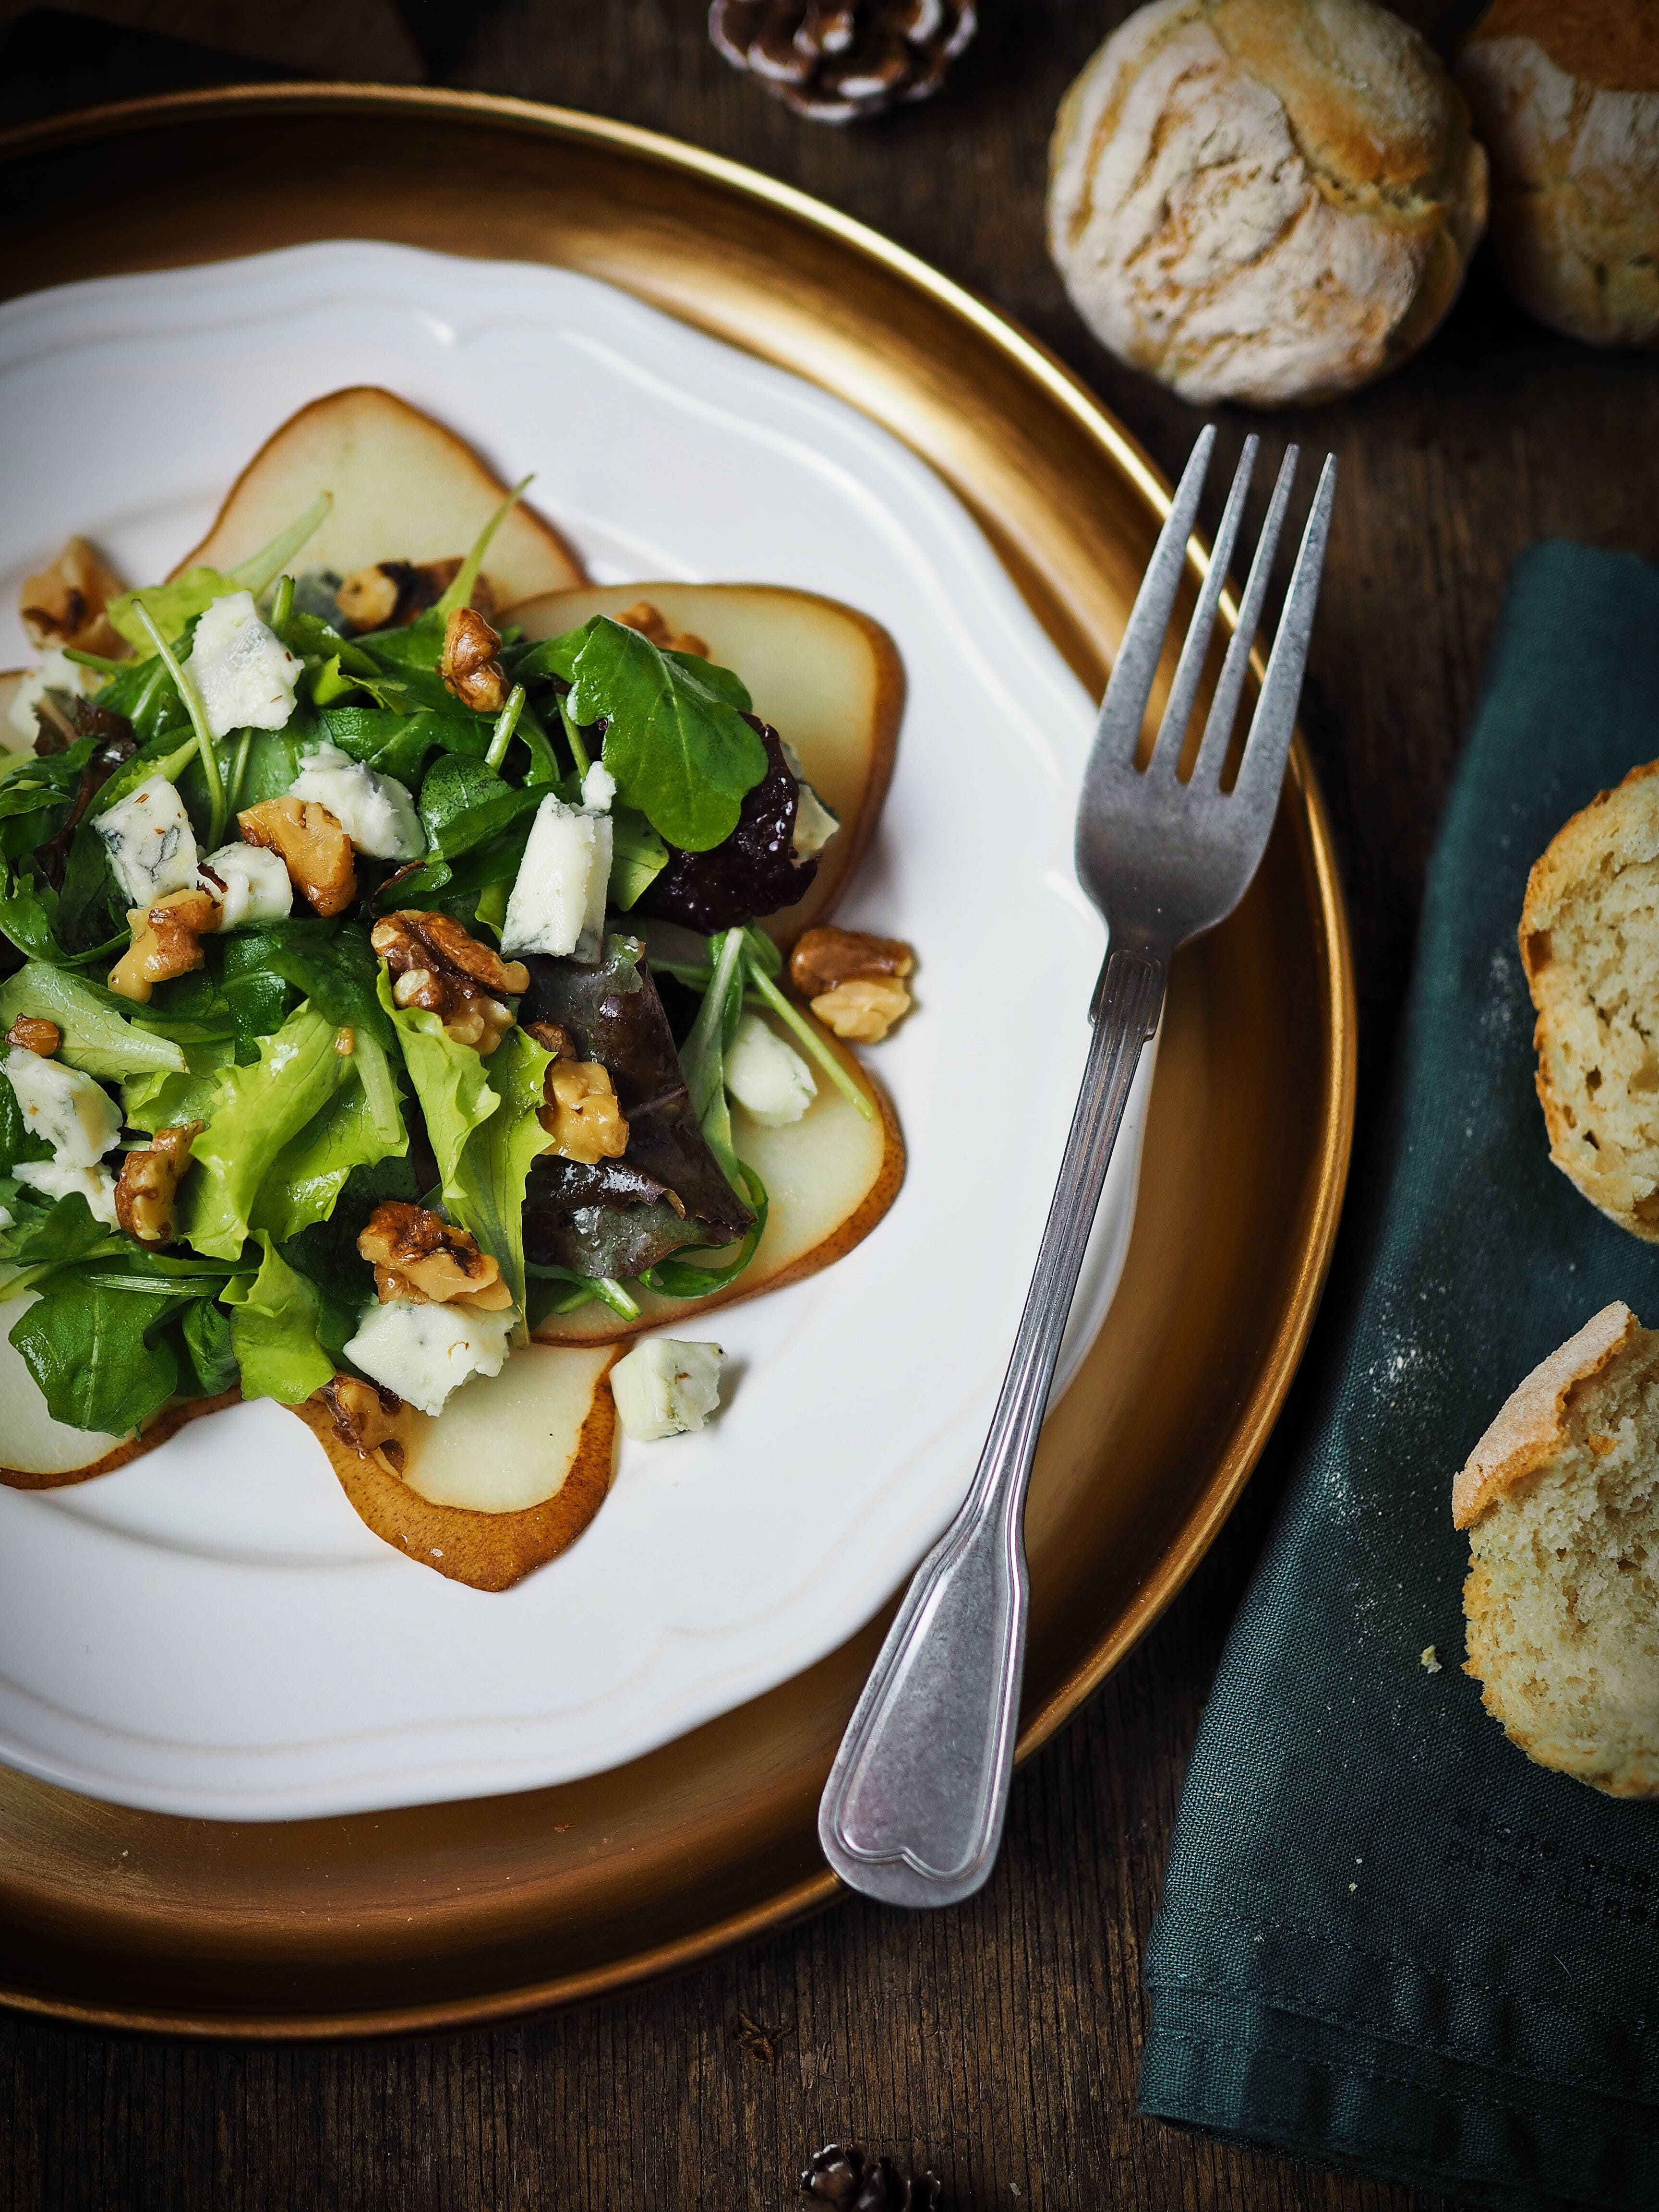 Birnen-Carpaccio mit Pflücksalat, Gorgonzola & Walnüssen